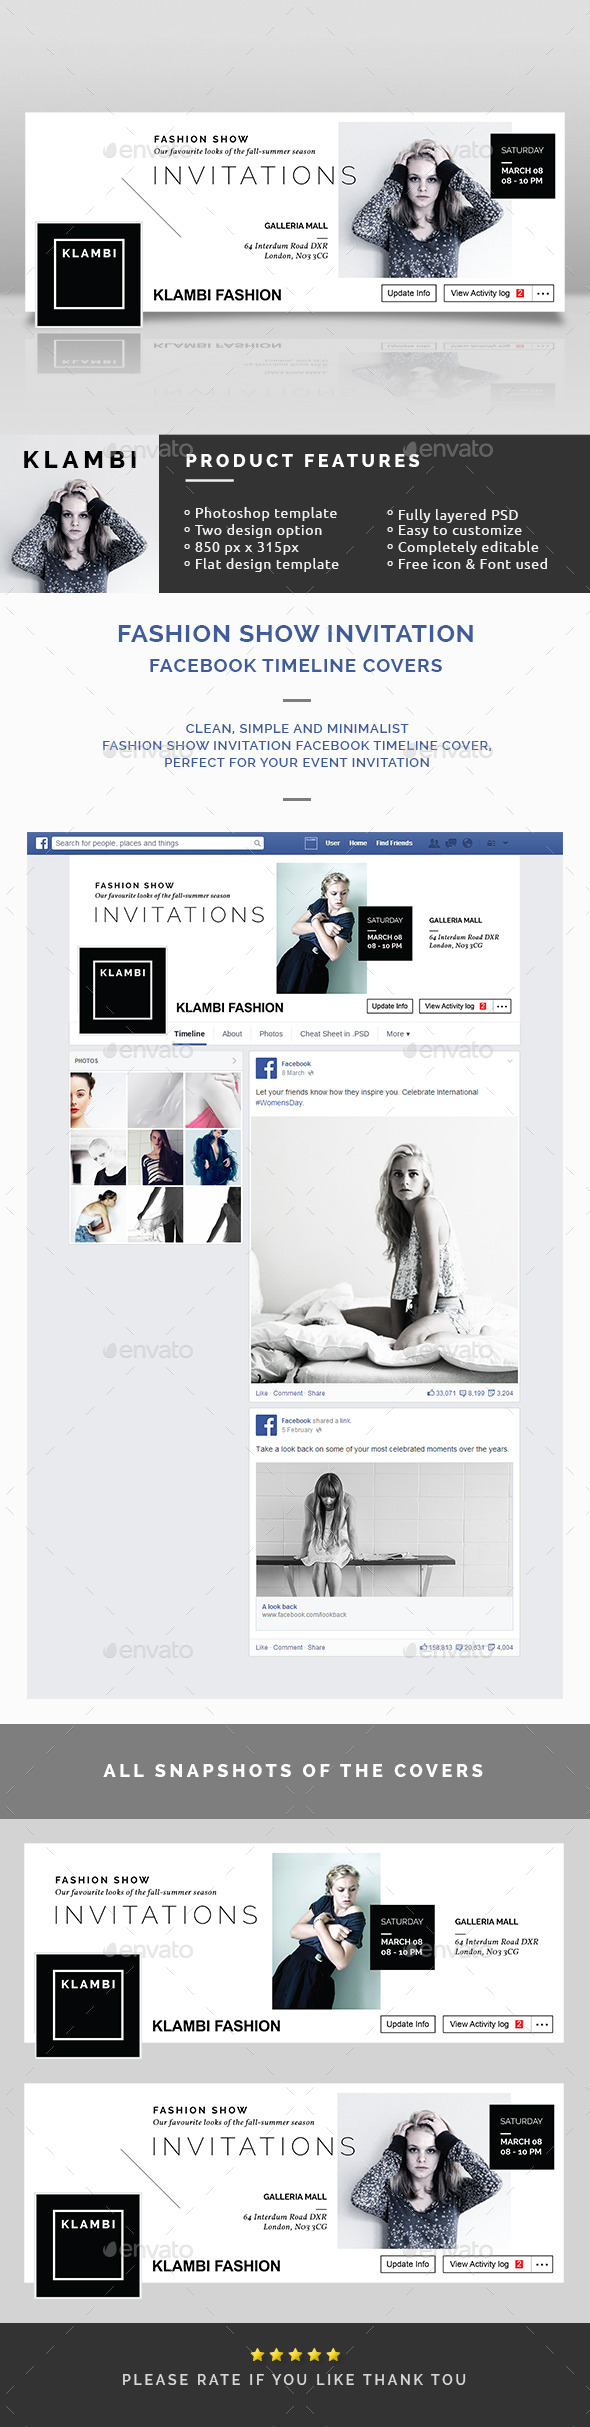 Fashion Show Invitation Facebook Timeline Covers - Facebook Timeline Covers Social Media